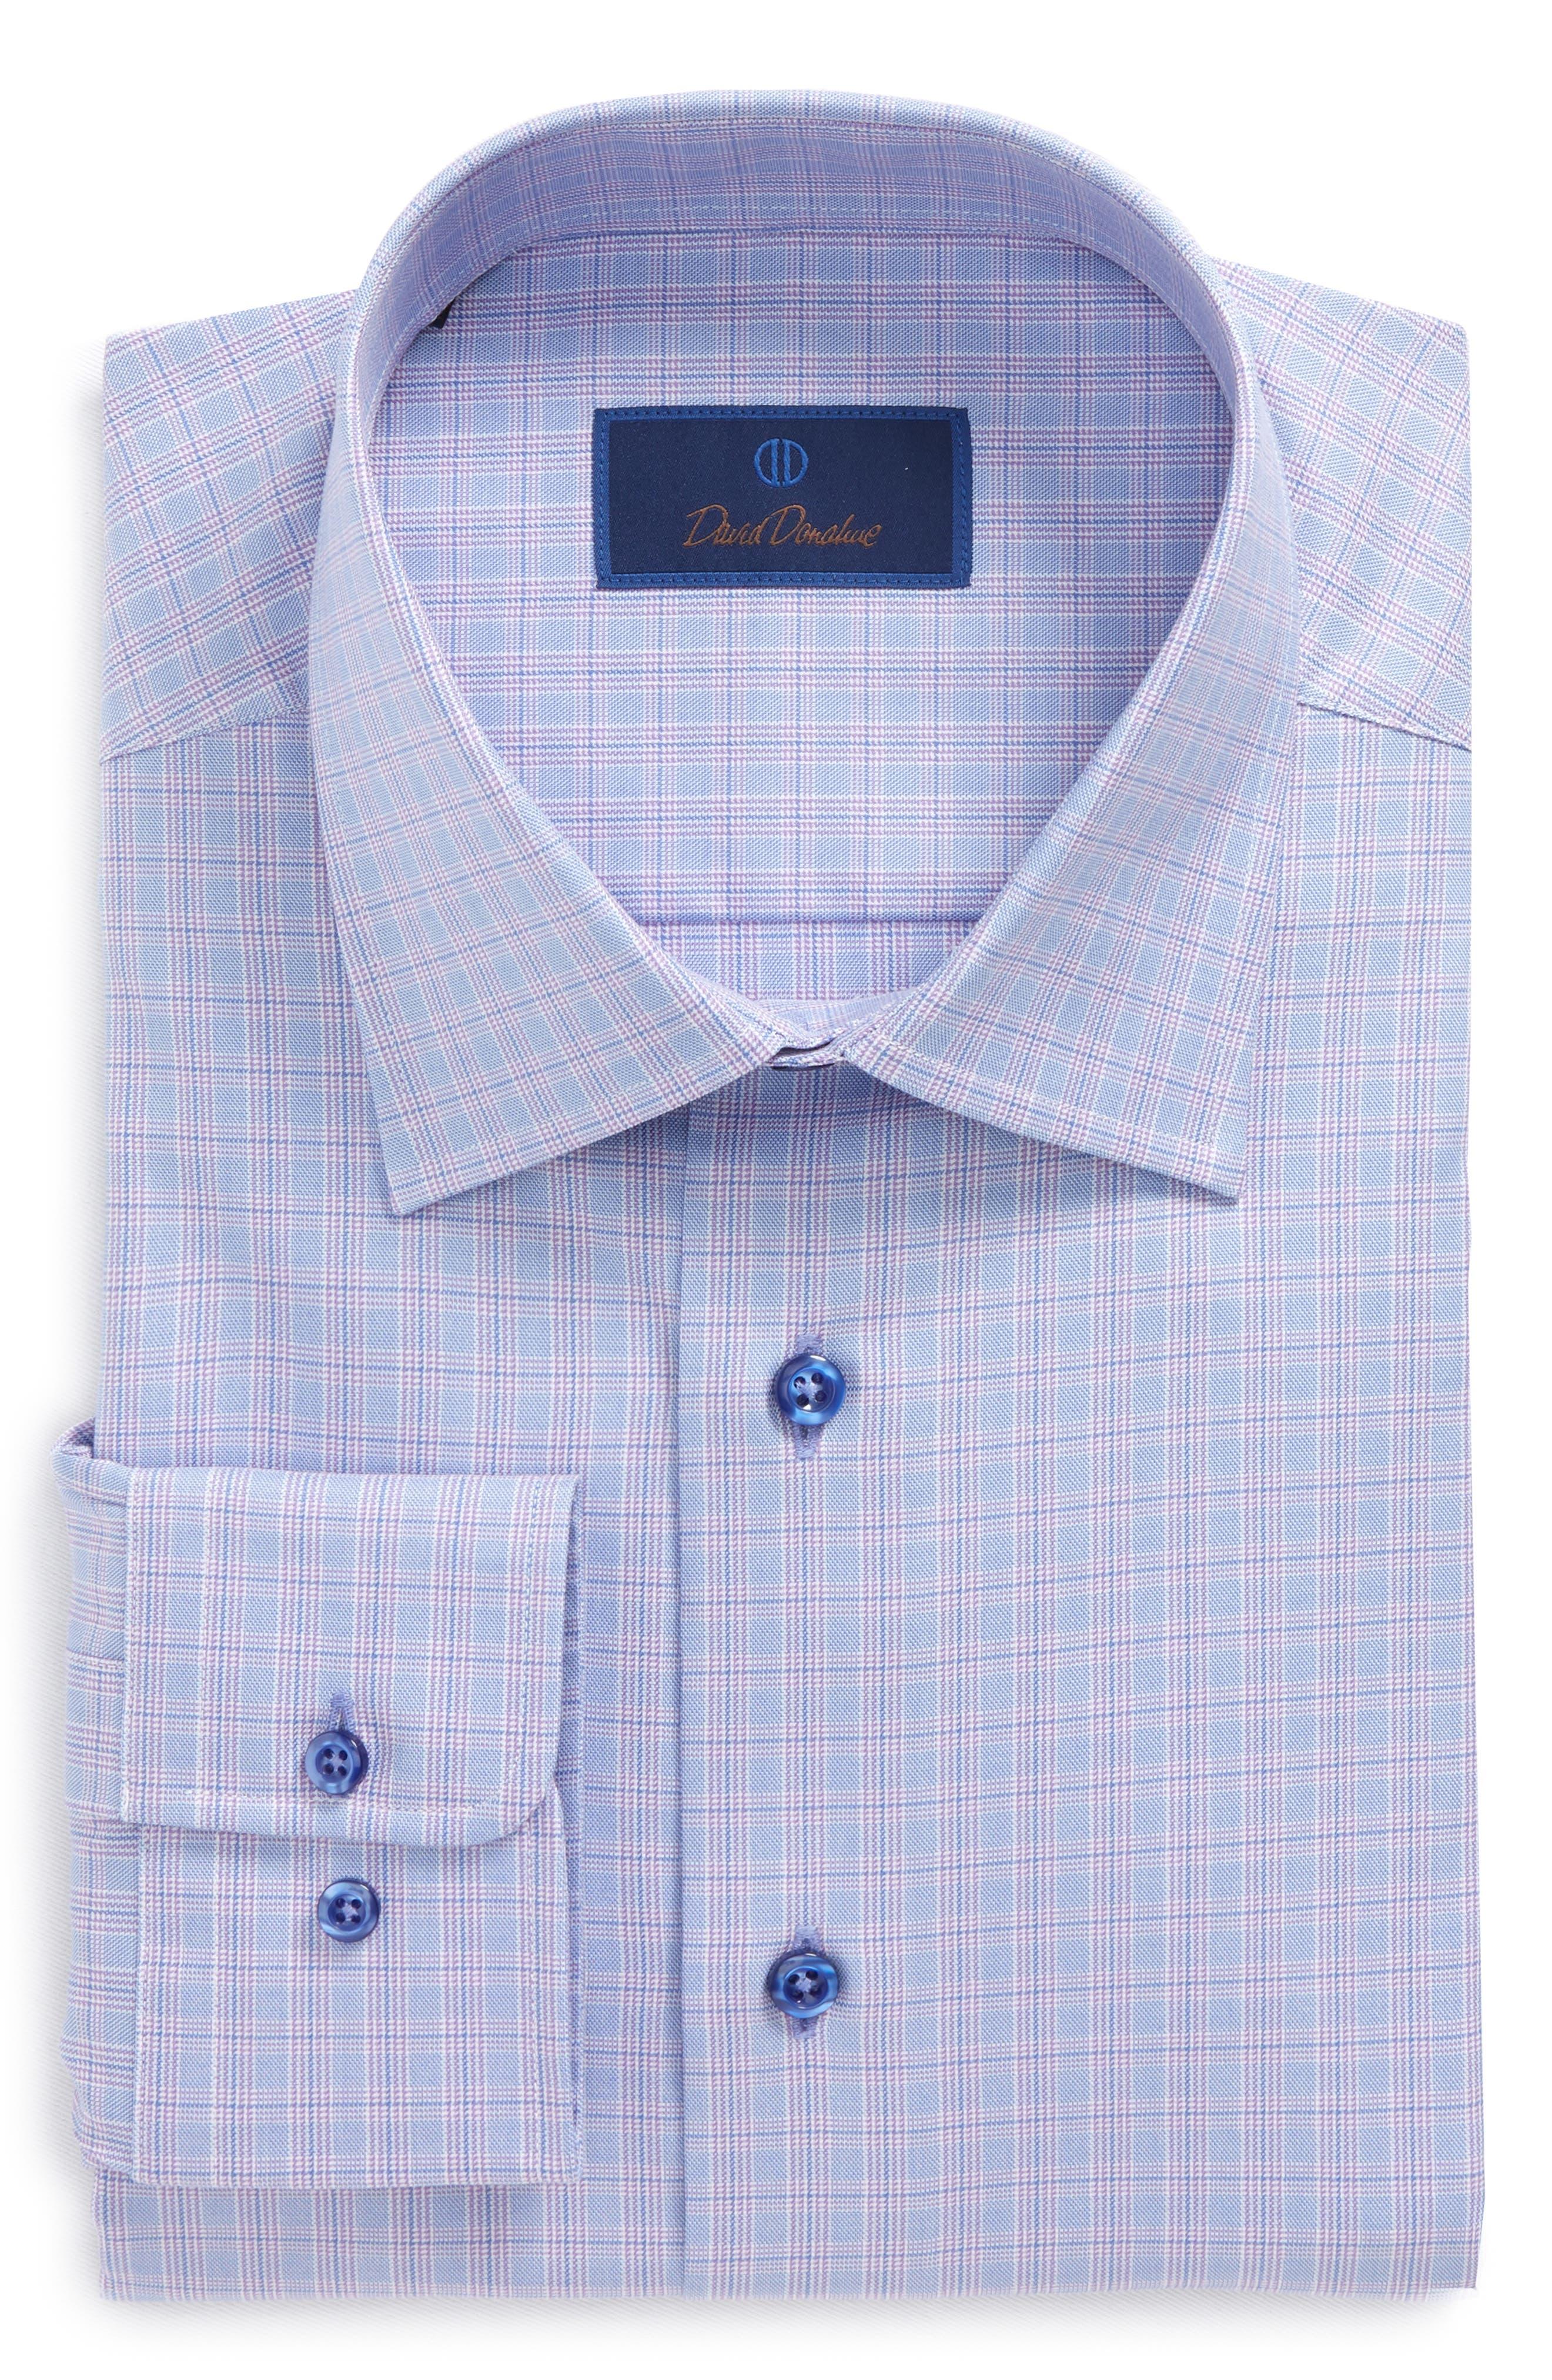 Regular Fit Plaid Dress Shirt,                             Main thumbnail 1, color,                             Lilac